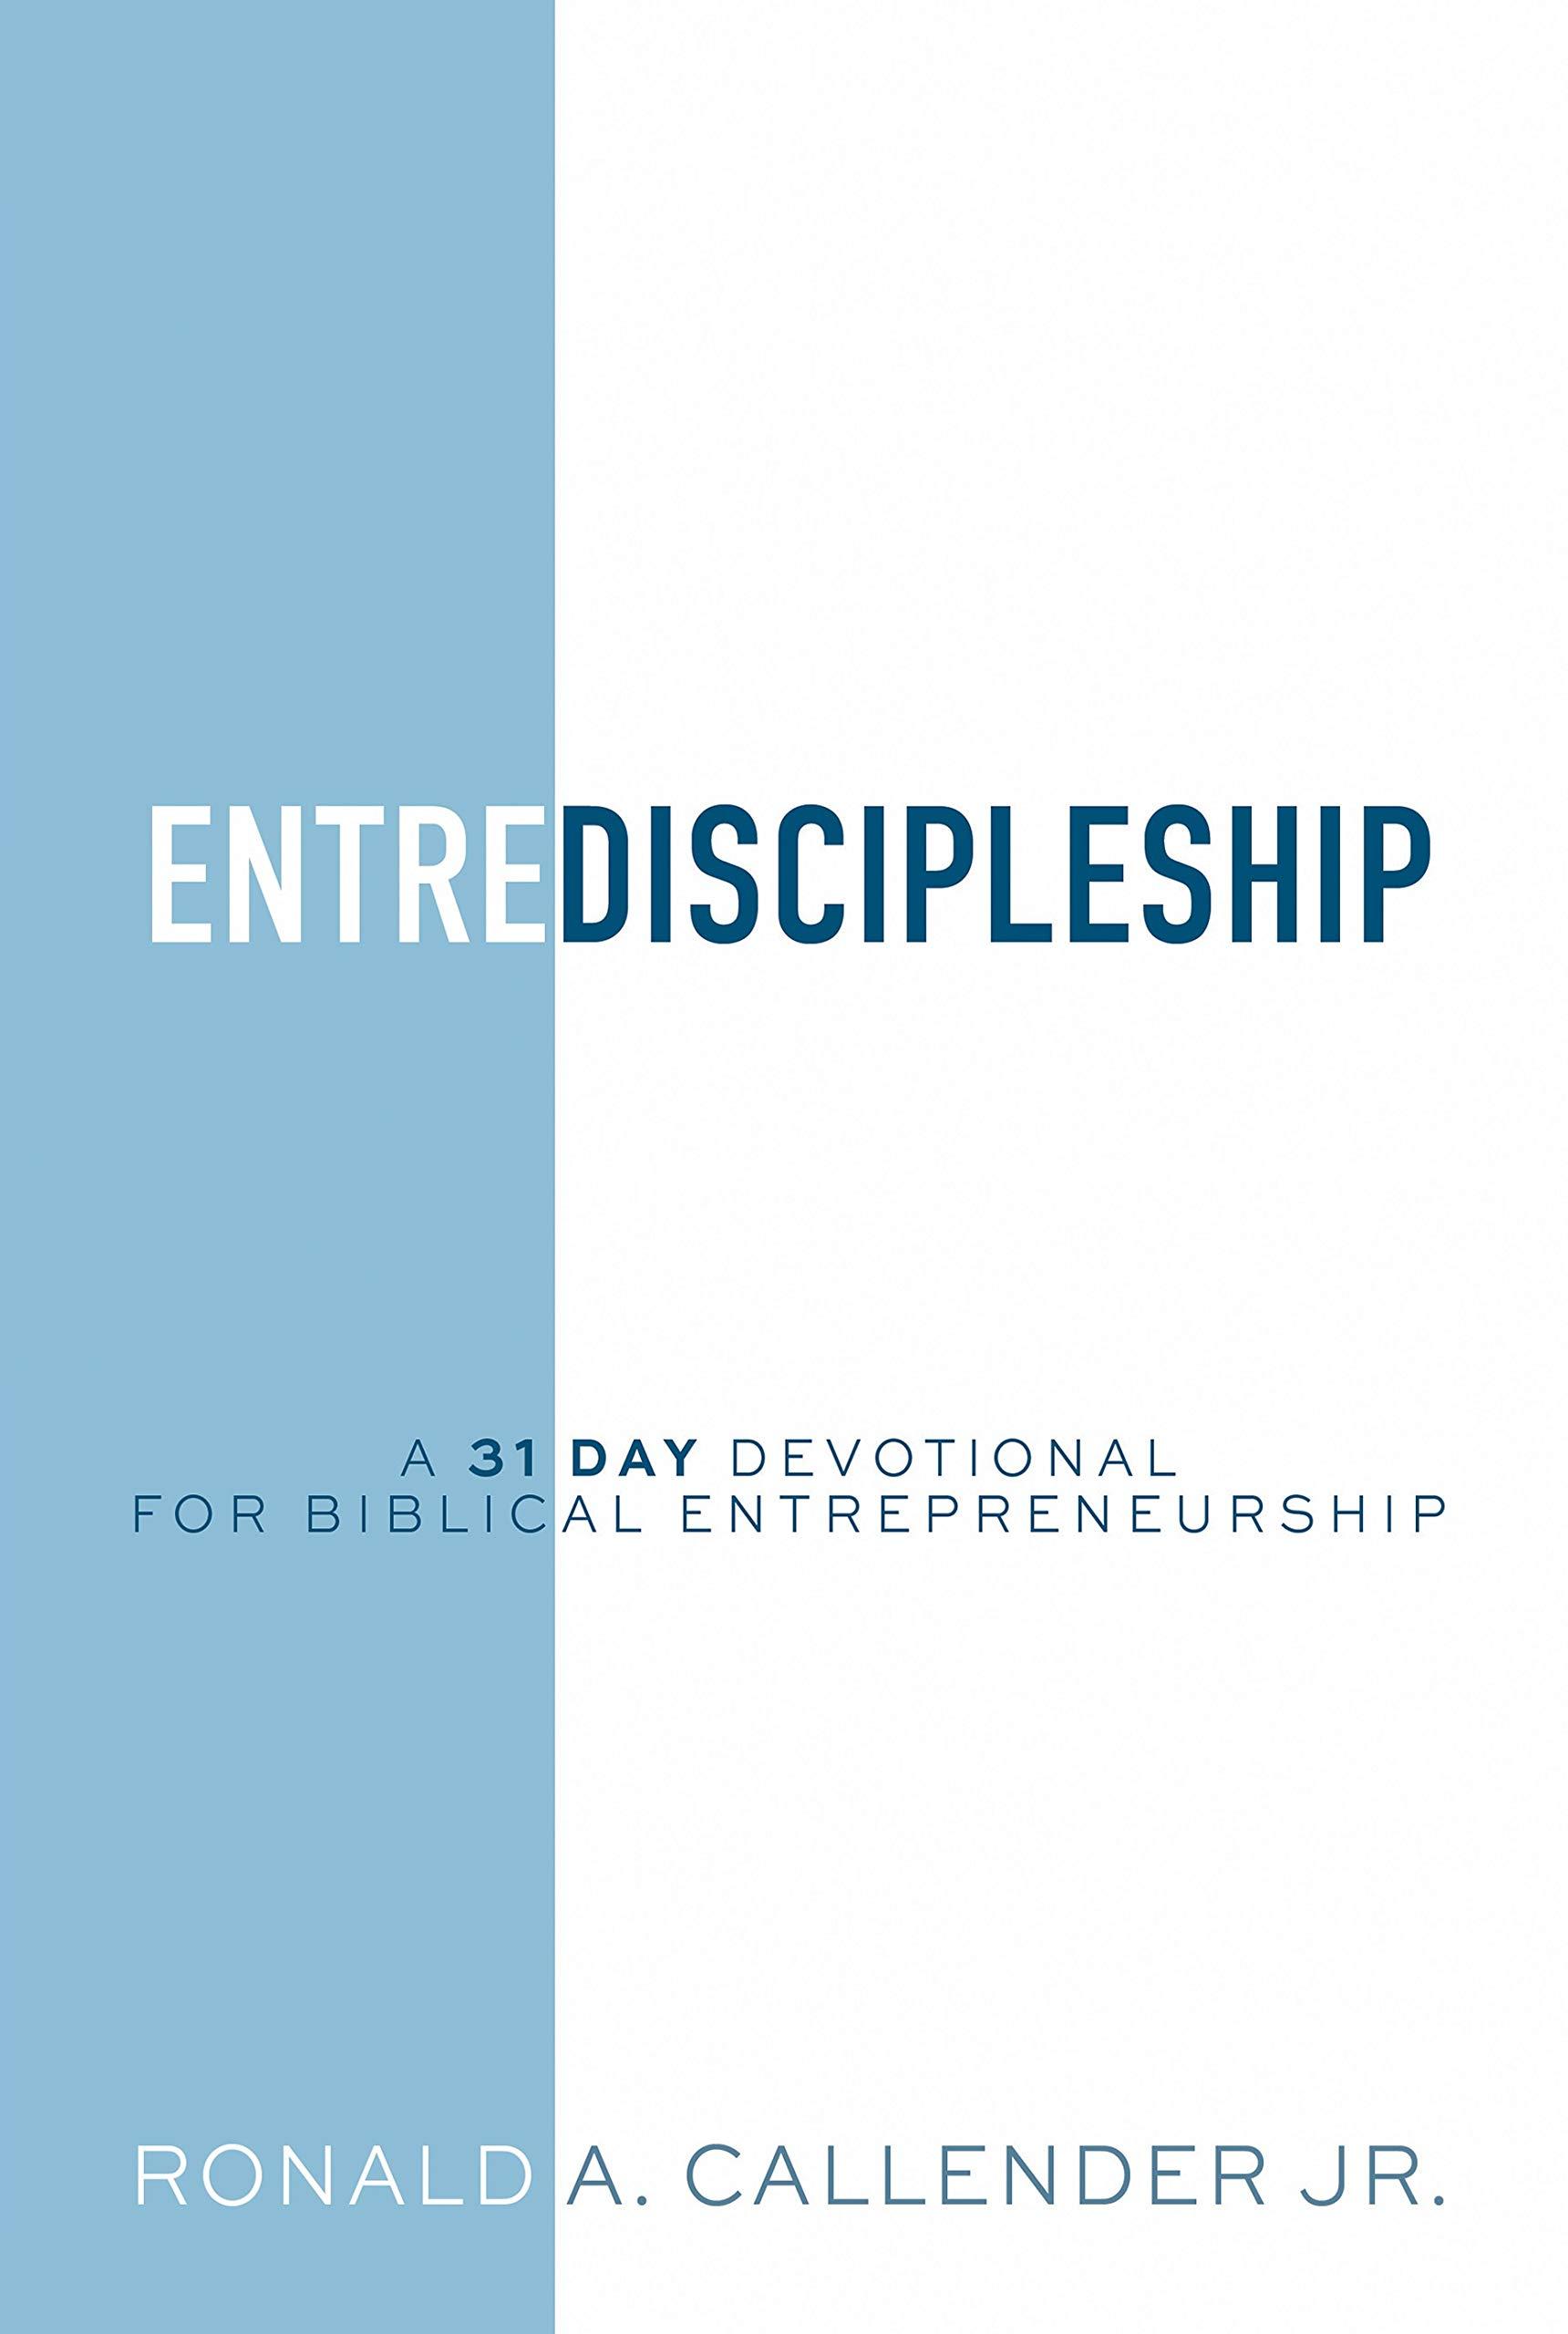 EntreDiscipleship: A 31 Day Devotional for Biblical Entrepreneurship